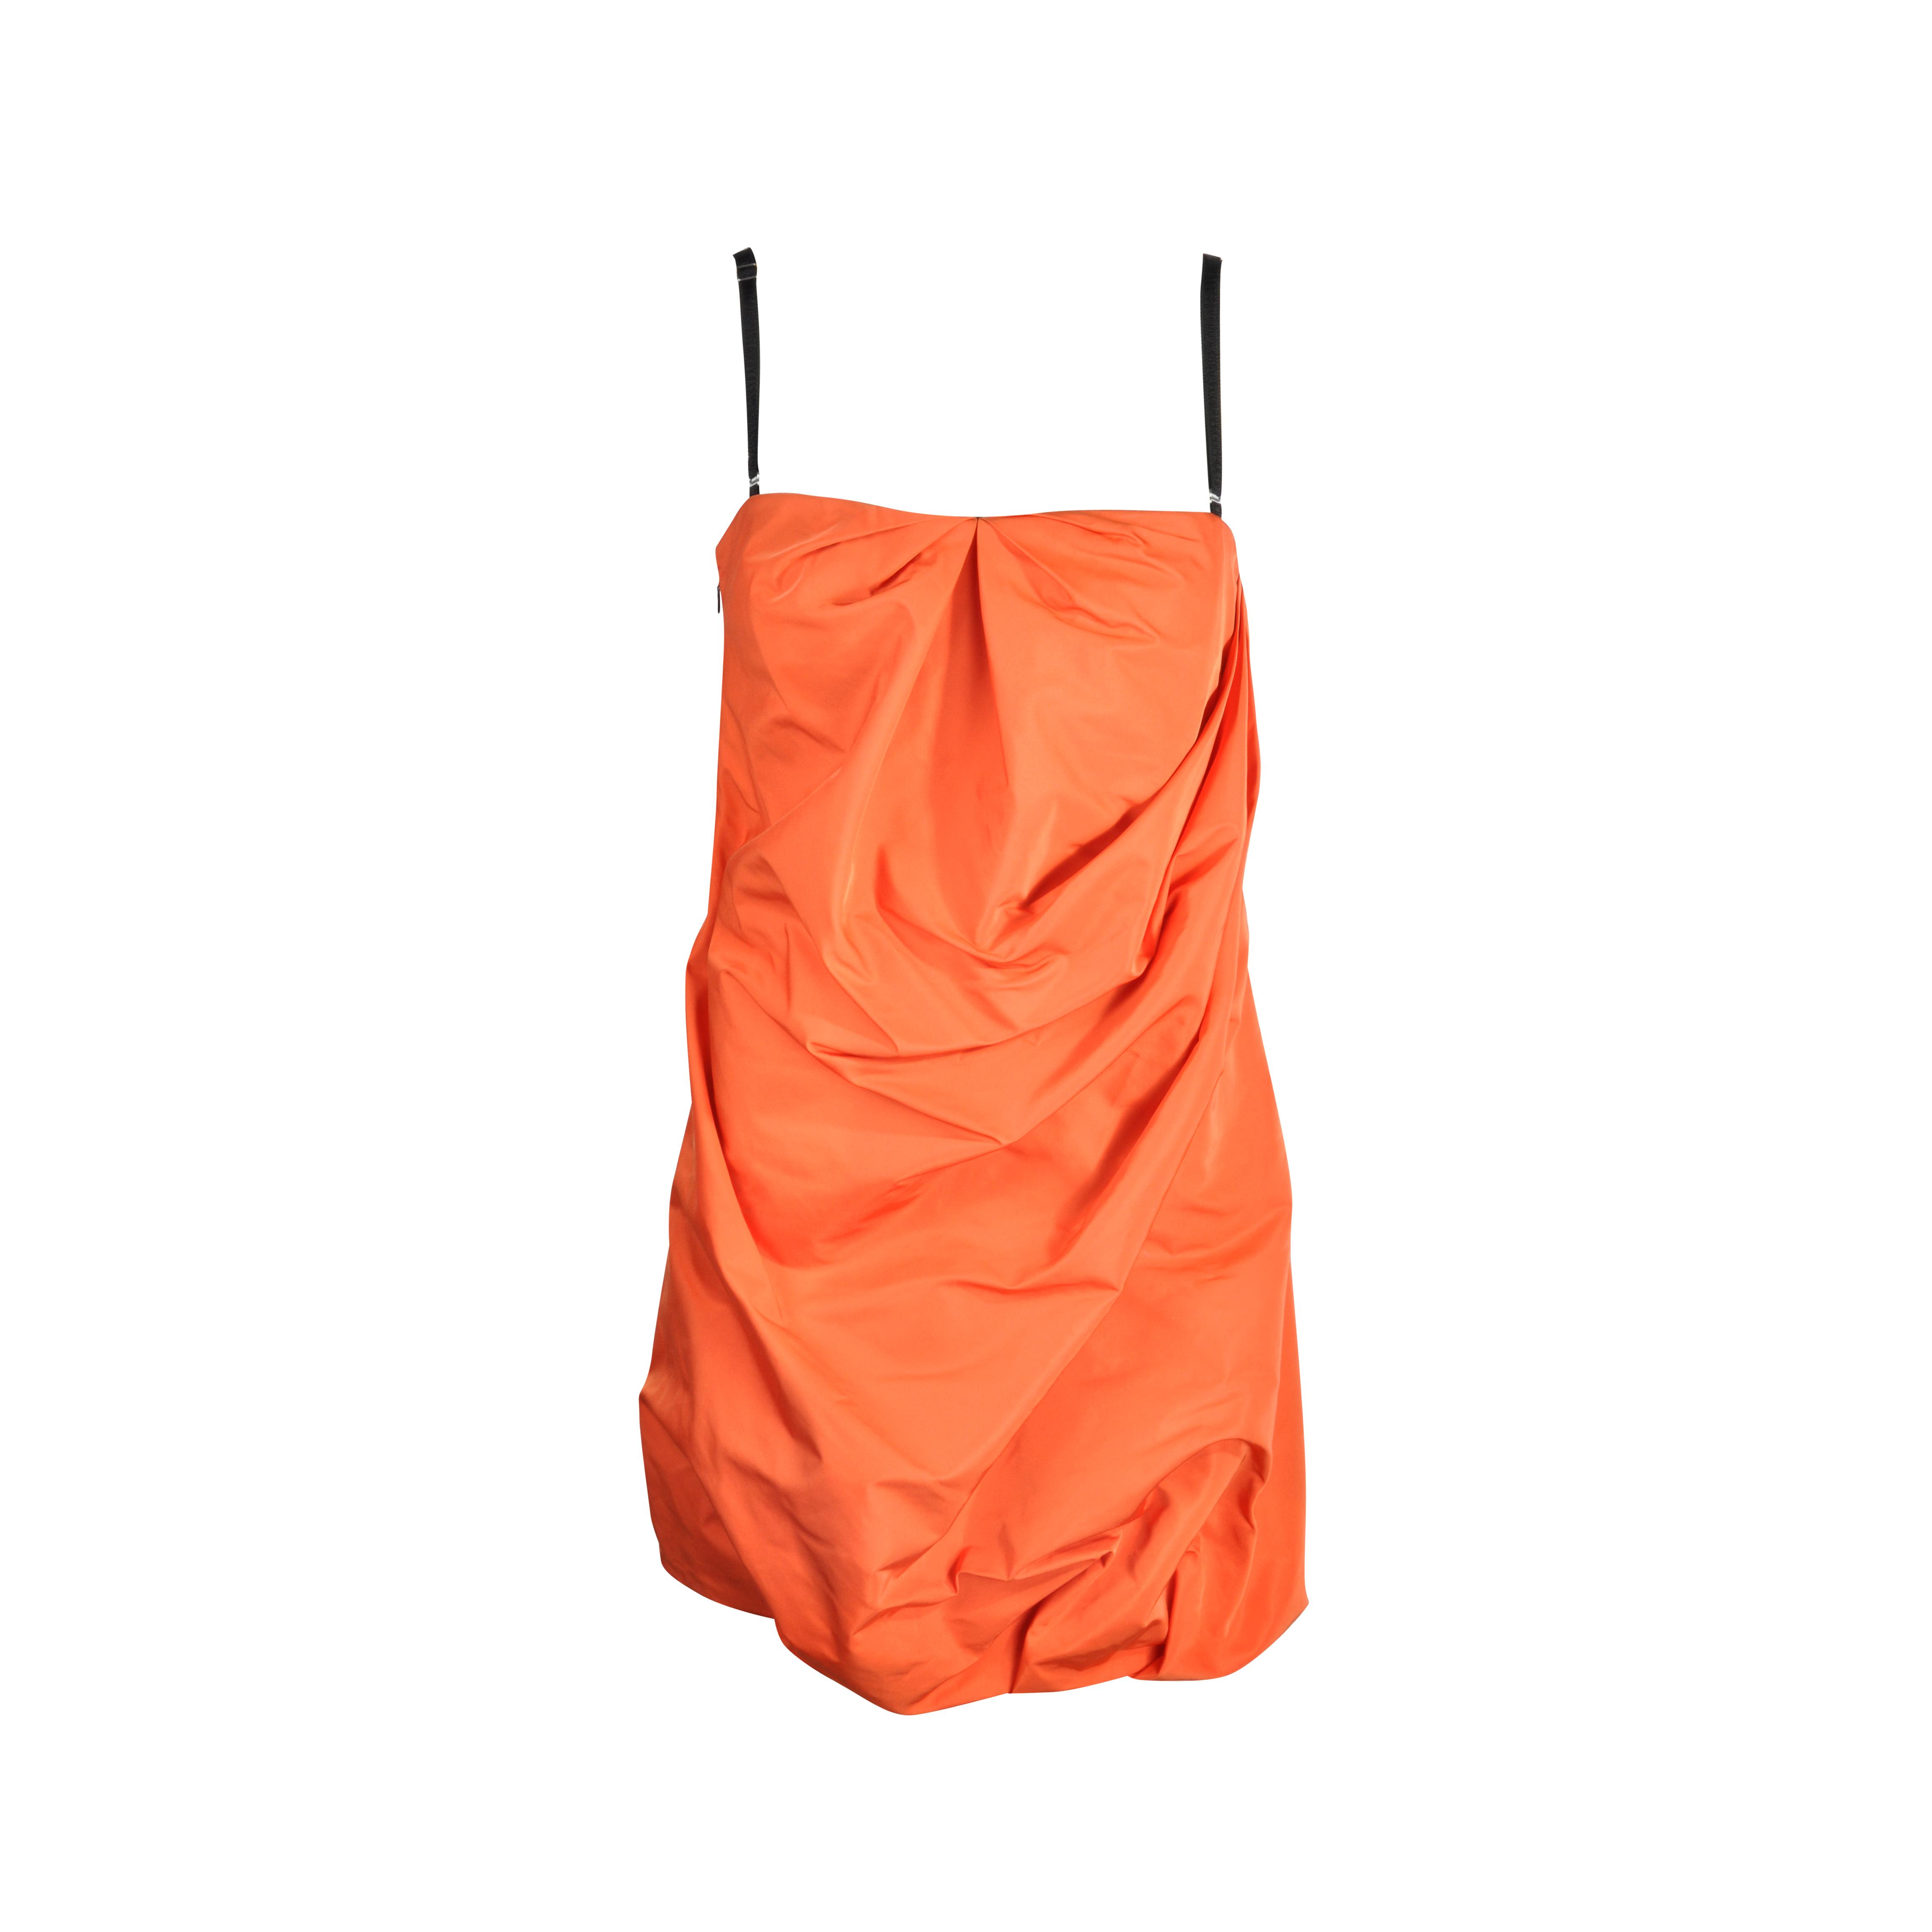 2fc26ed0aa1 Authentic Second Hand Dolce   Gabbana Balloon Dress (PSS-111-00001 ...